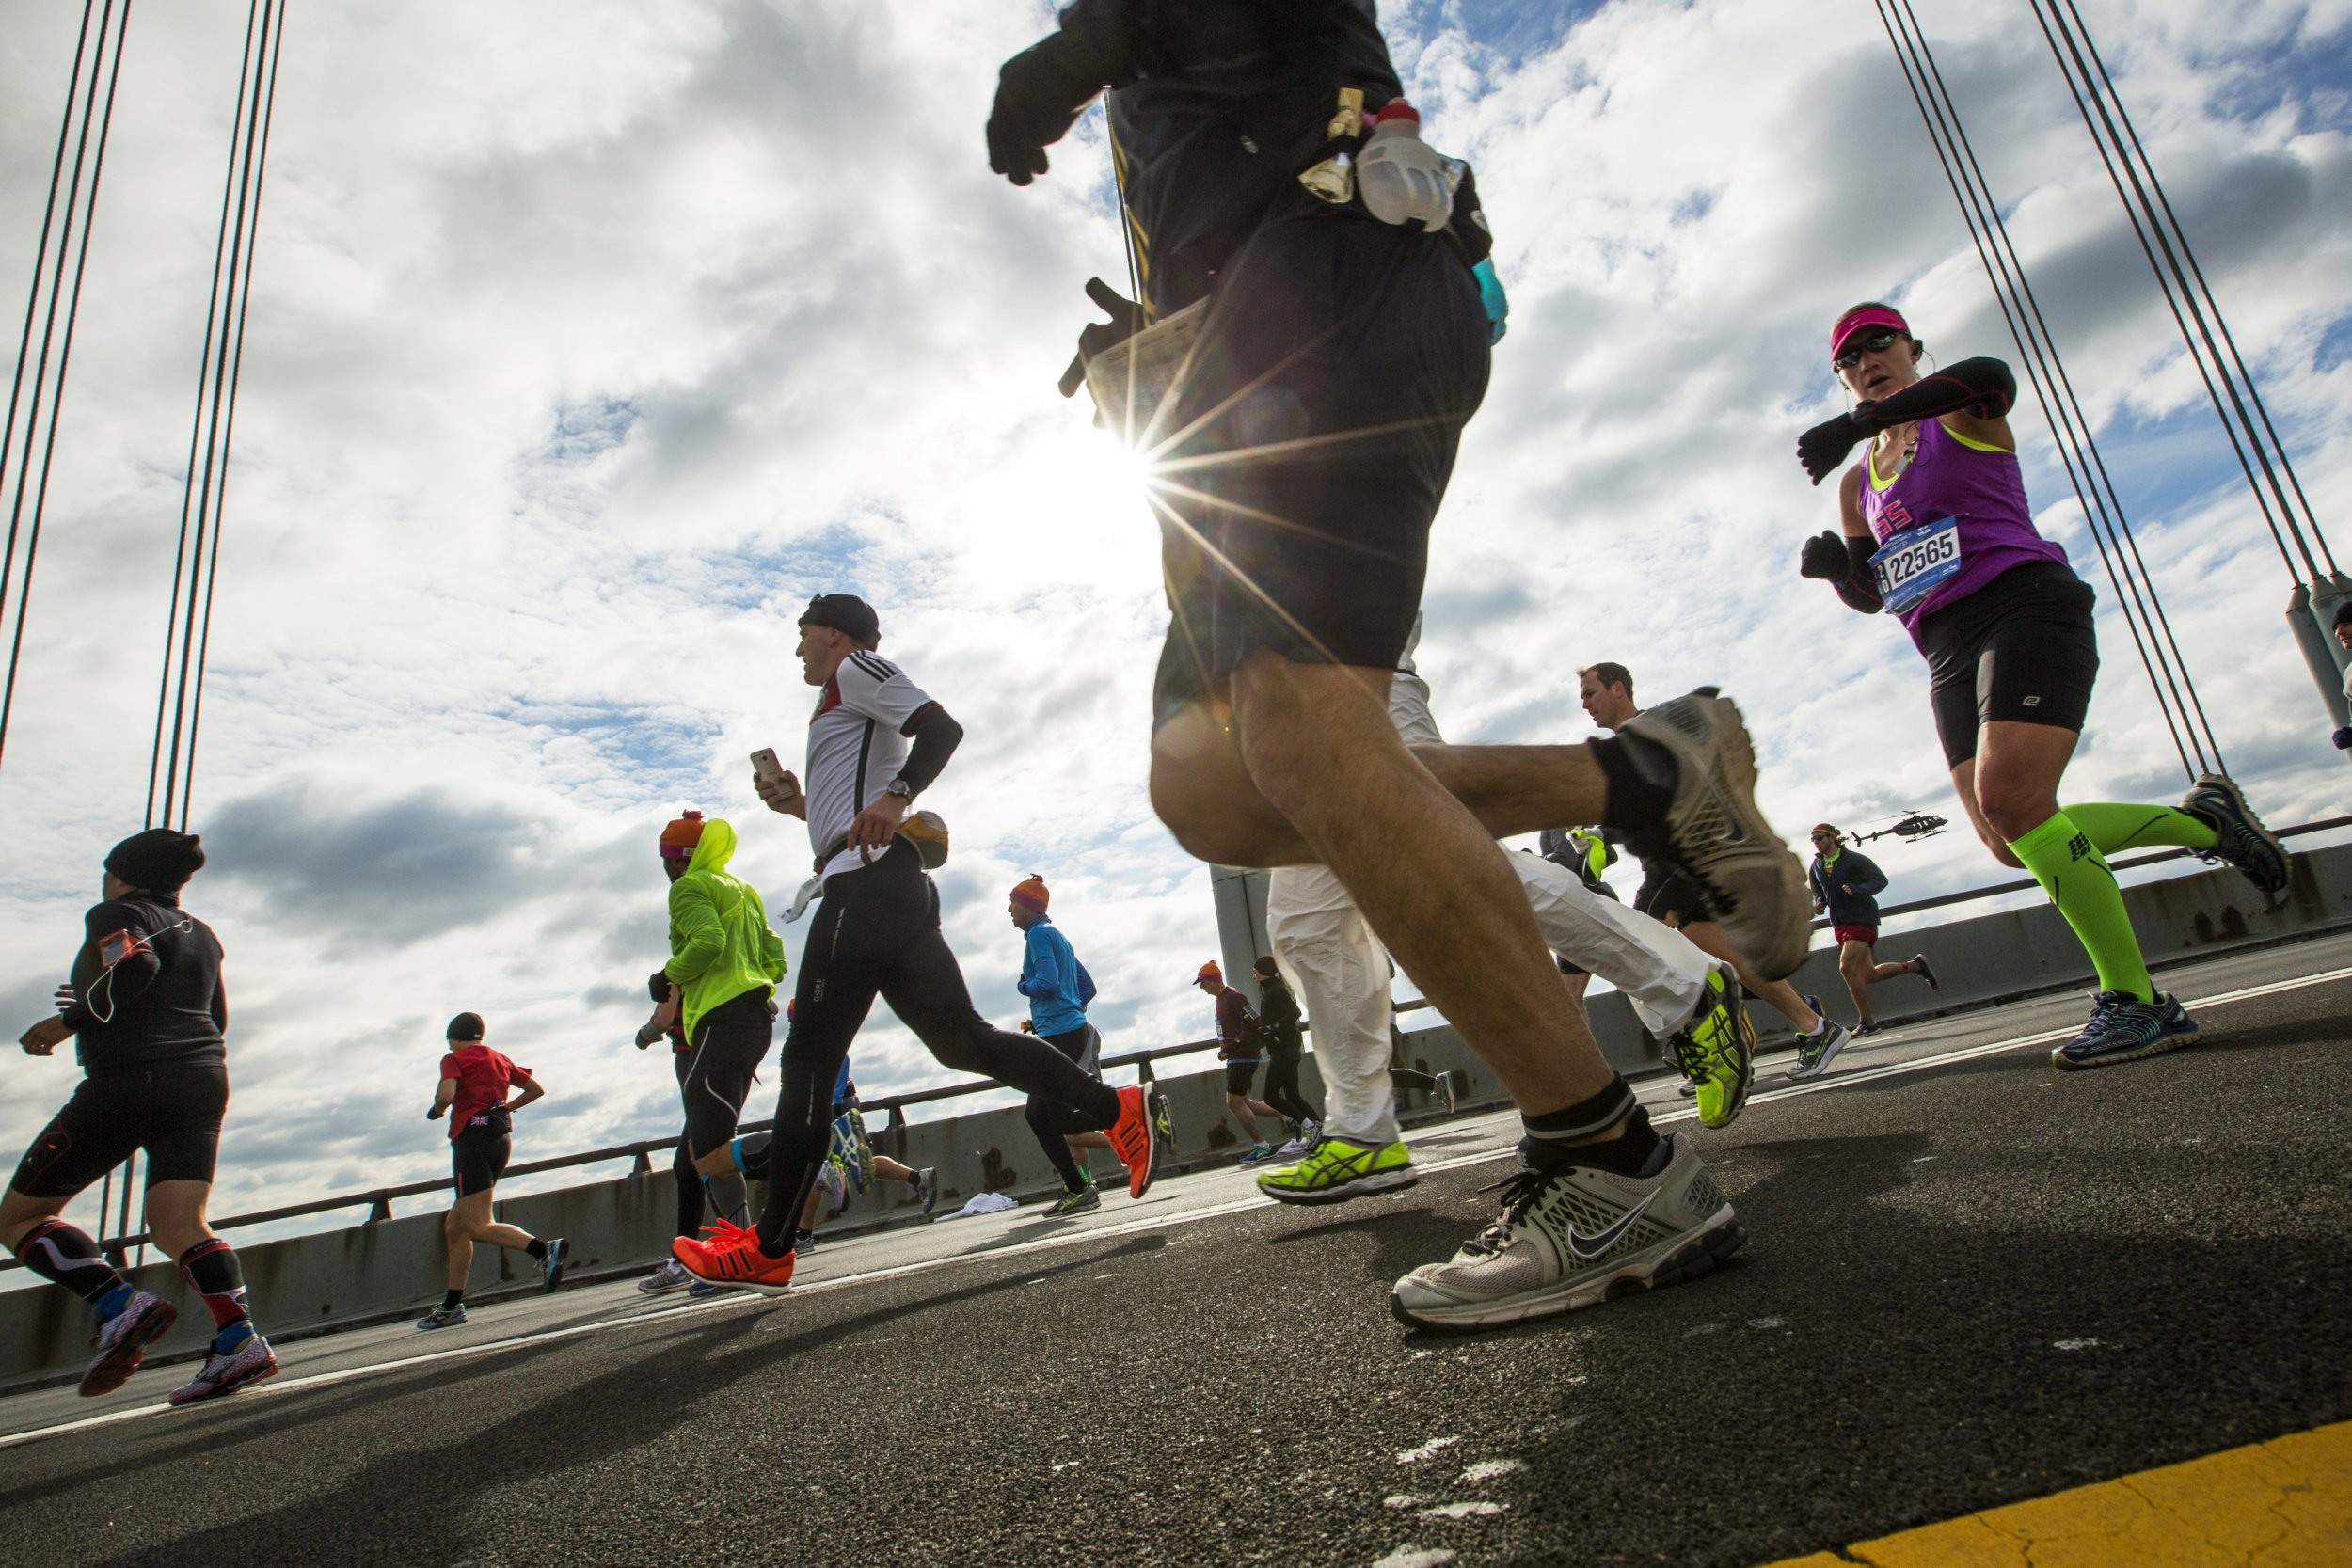 Runners take part in the New York City Marathon, November 2, 2014